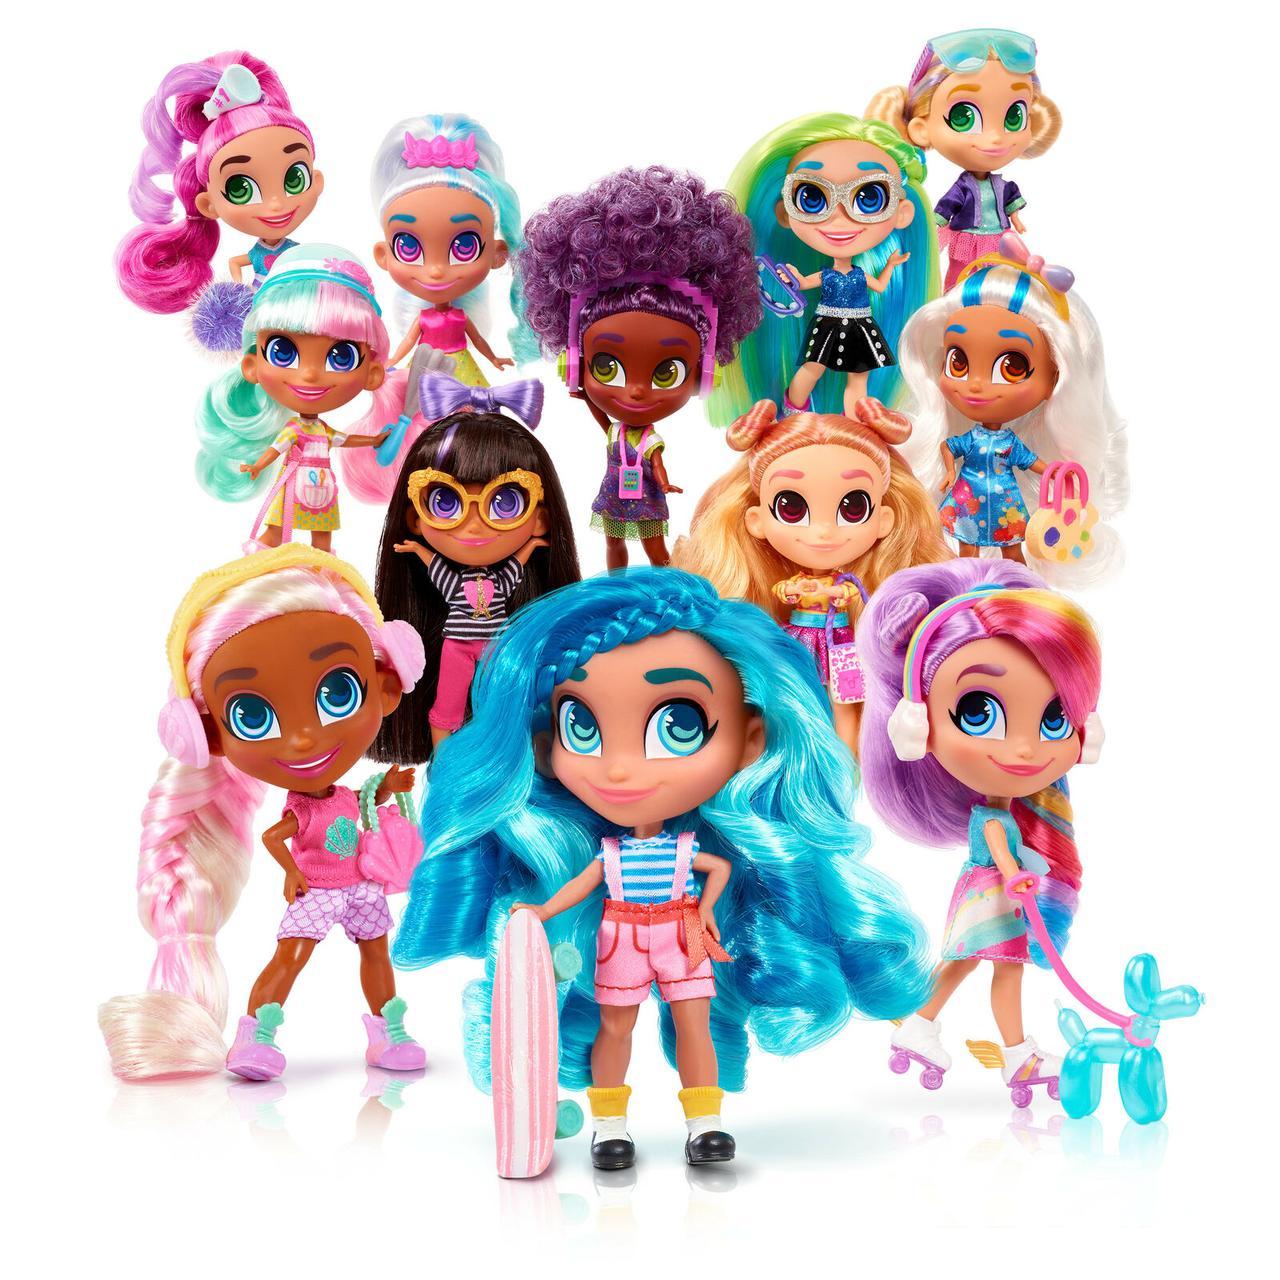 Hairdorables Кукла-сюрприз с аксессуарами, Хэрдораблс (2 серия)